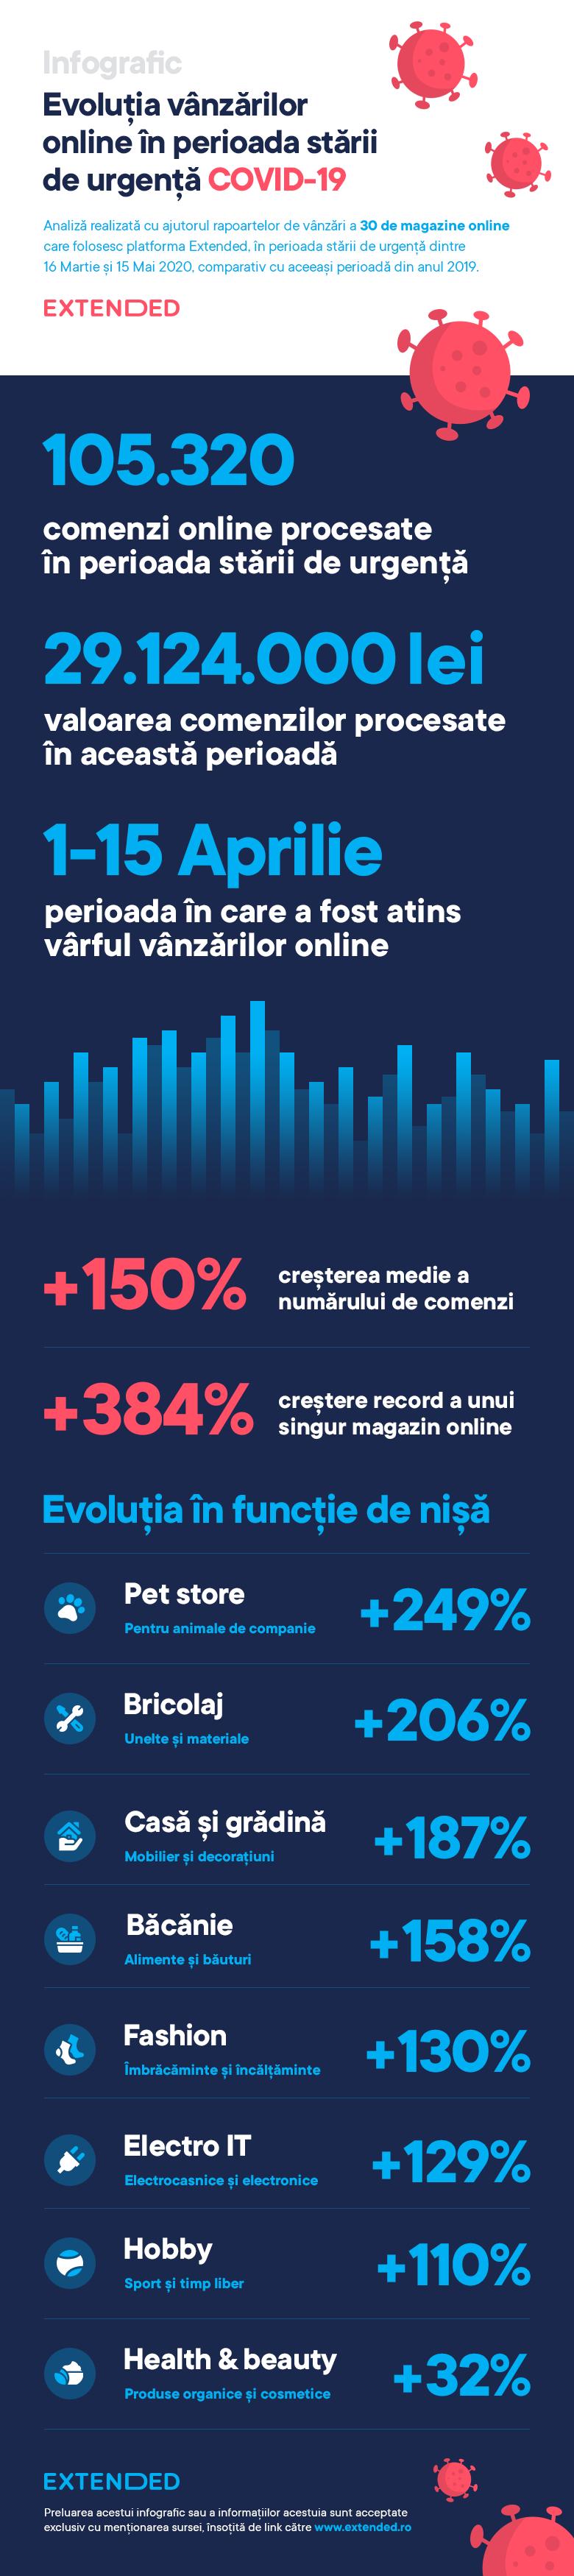 Infografic - Evolutie vanzari online COVID-19